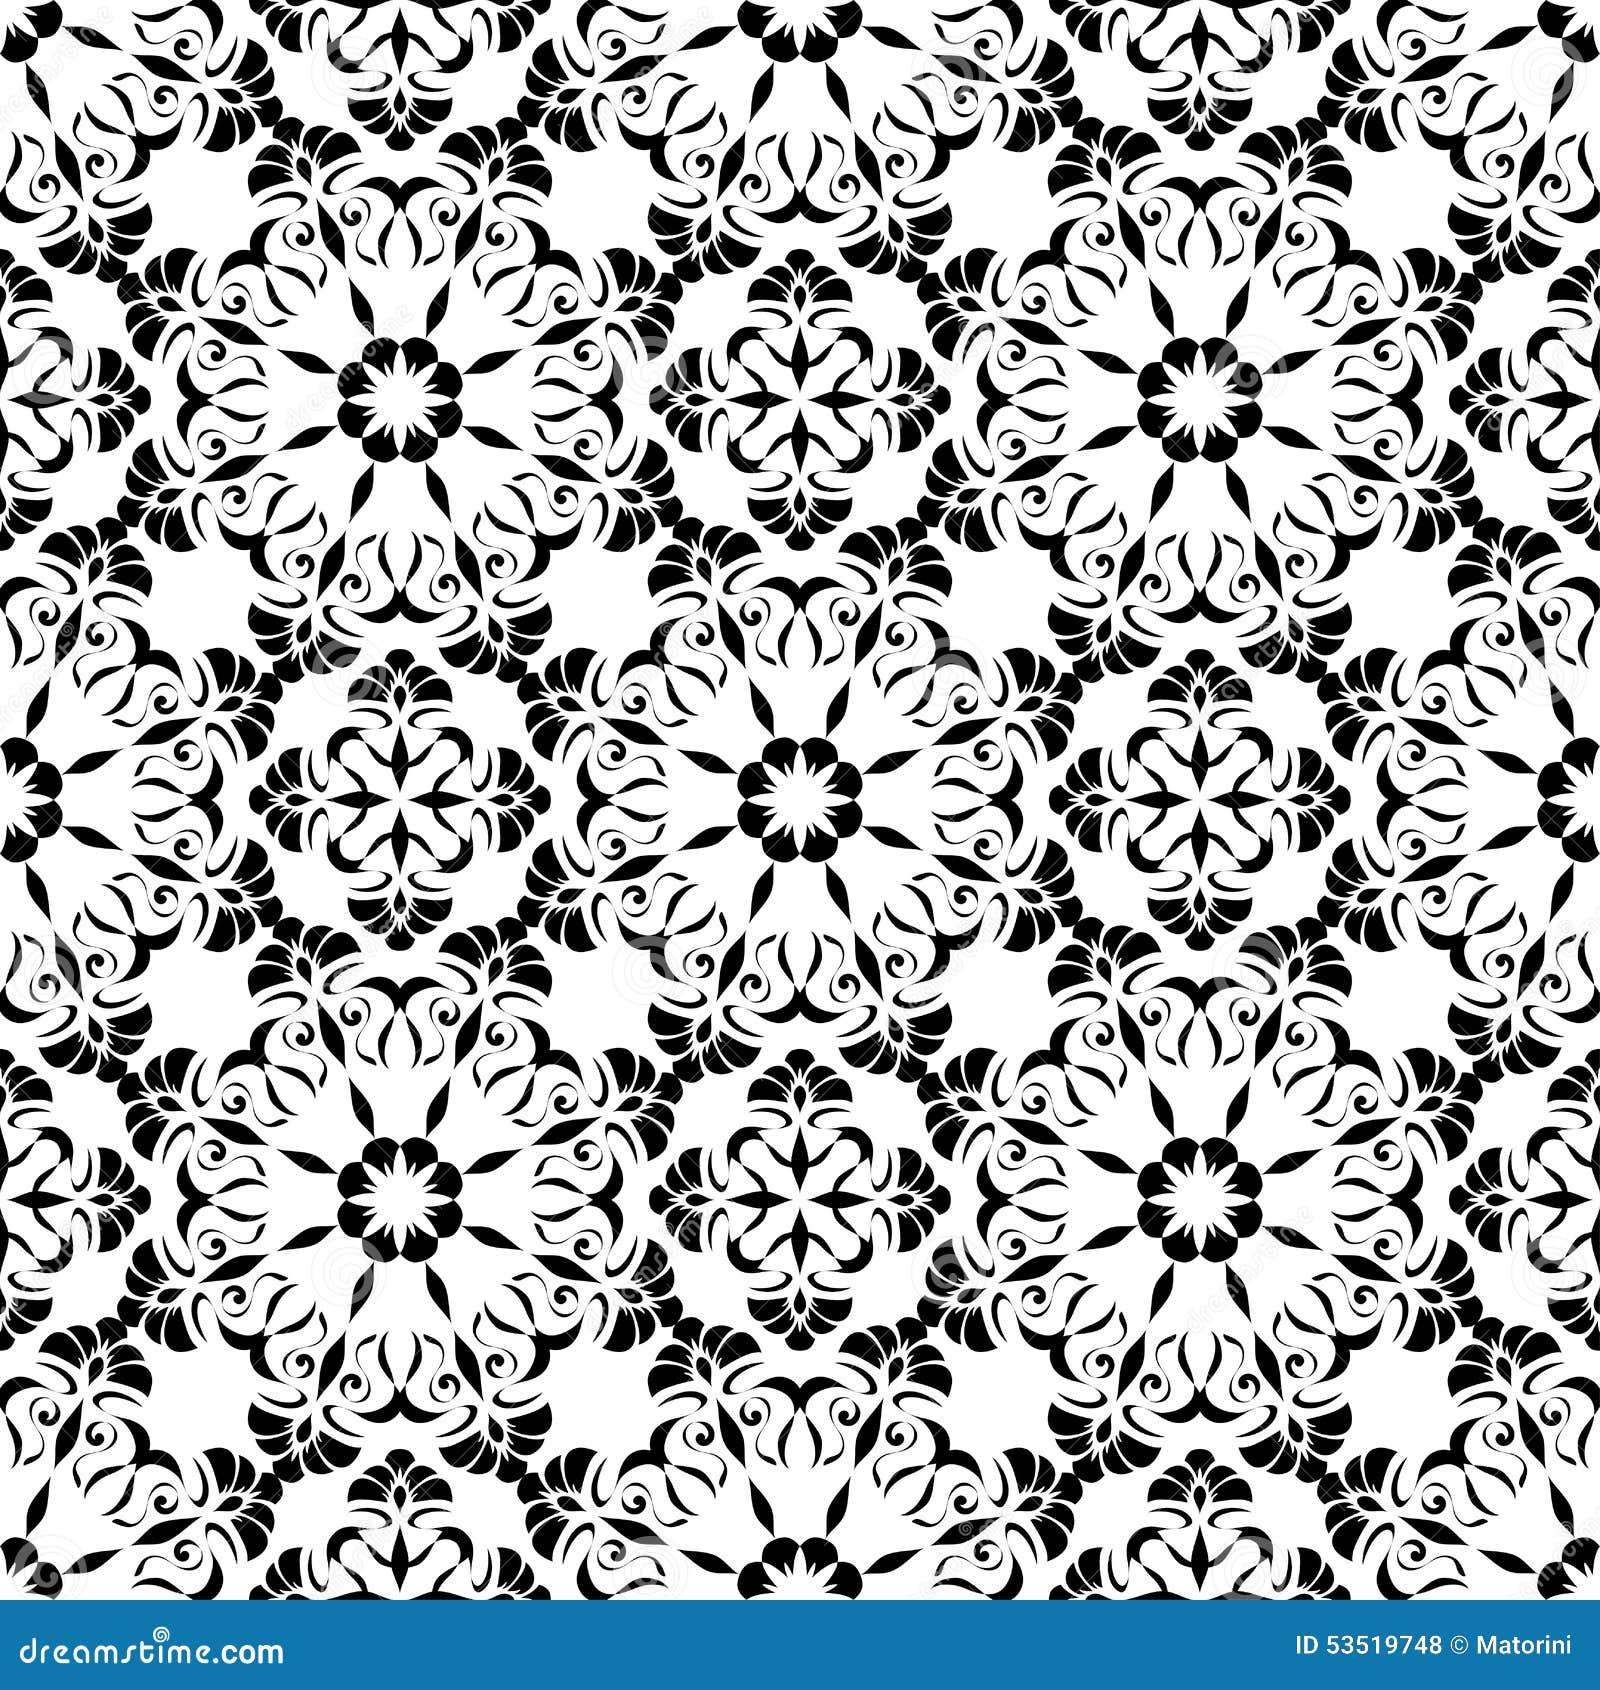 Elements Of Art Pattern : Seamless pattern of the elements art nouveau stock